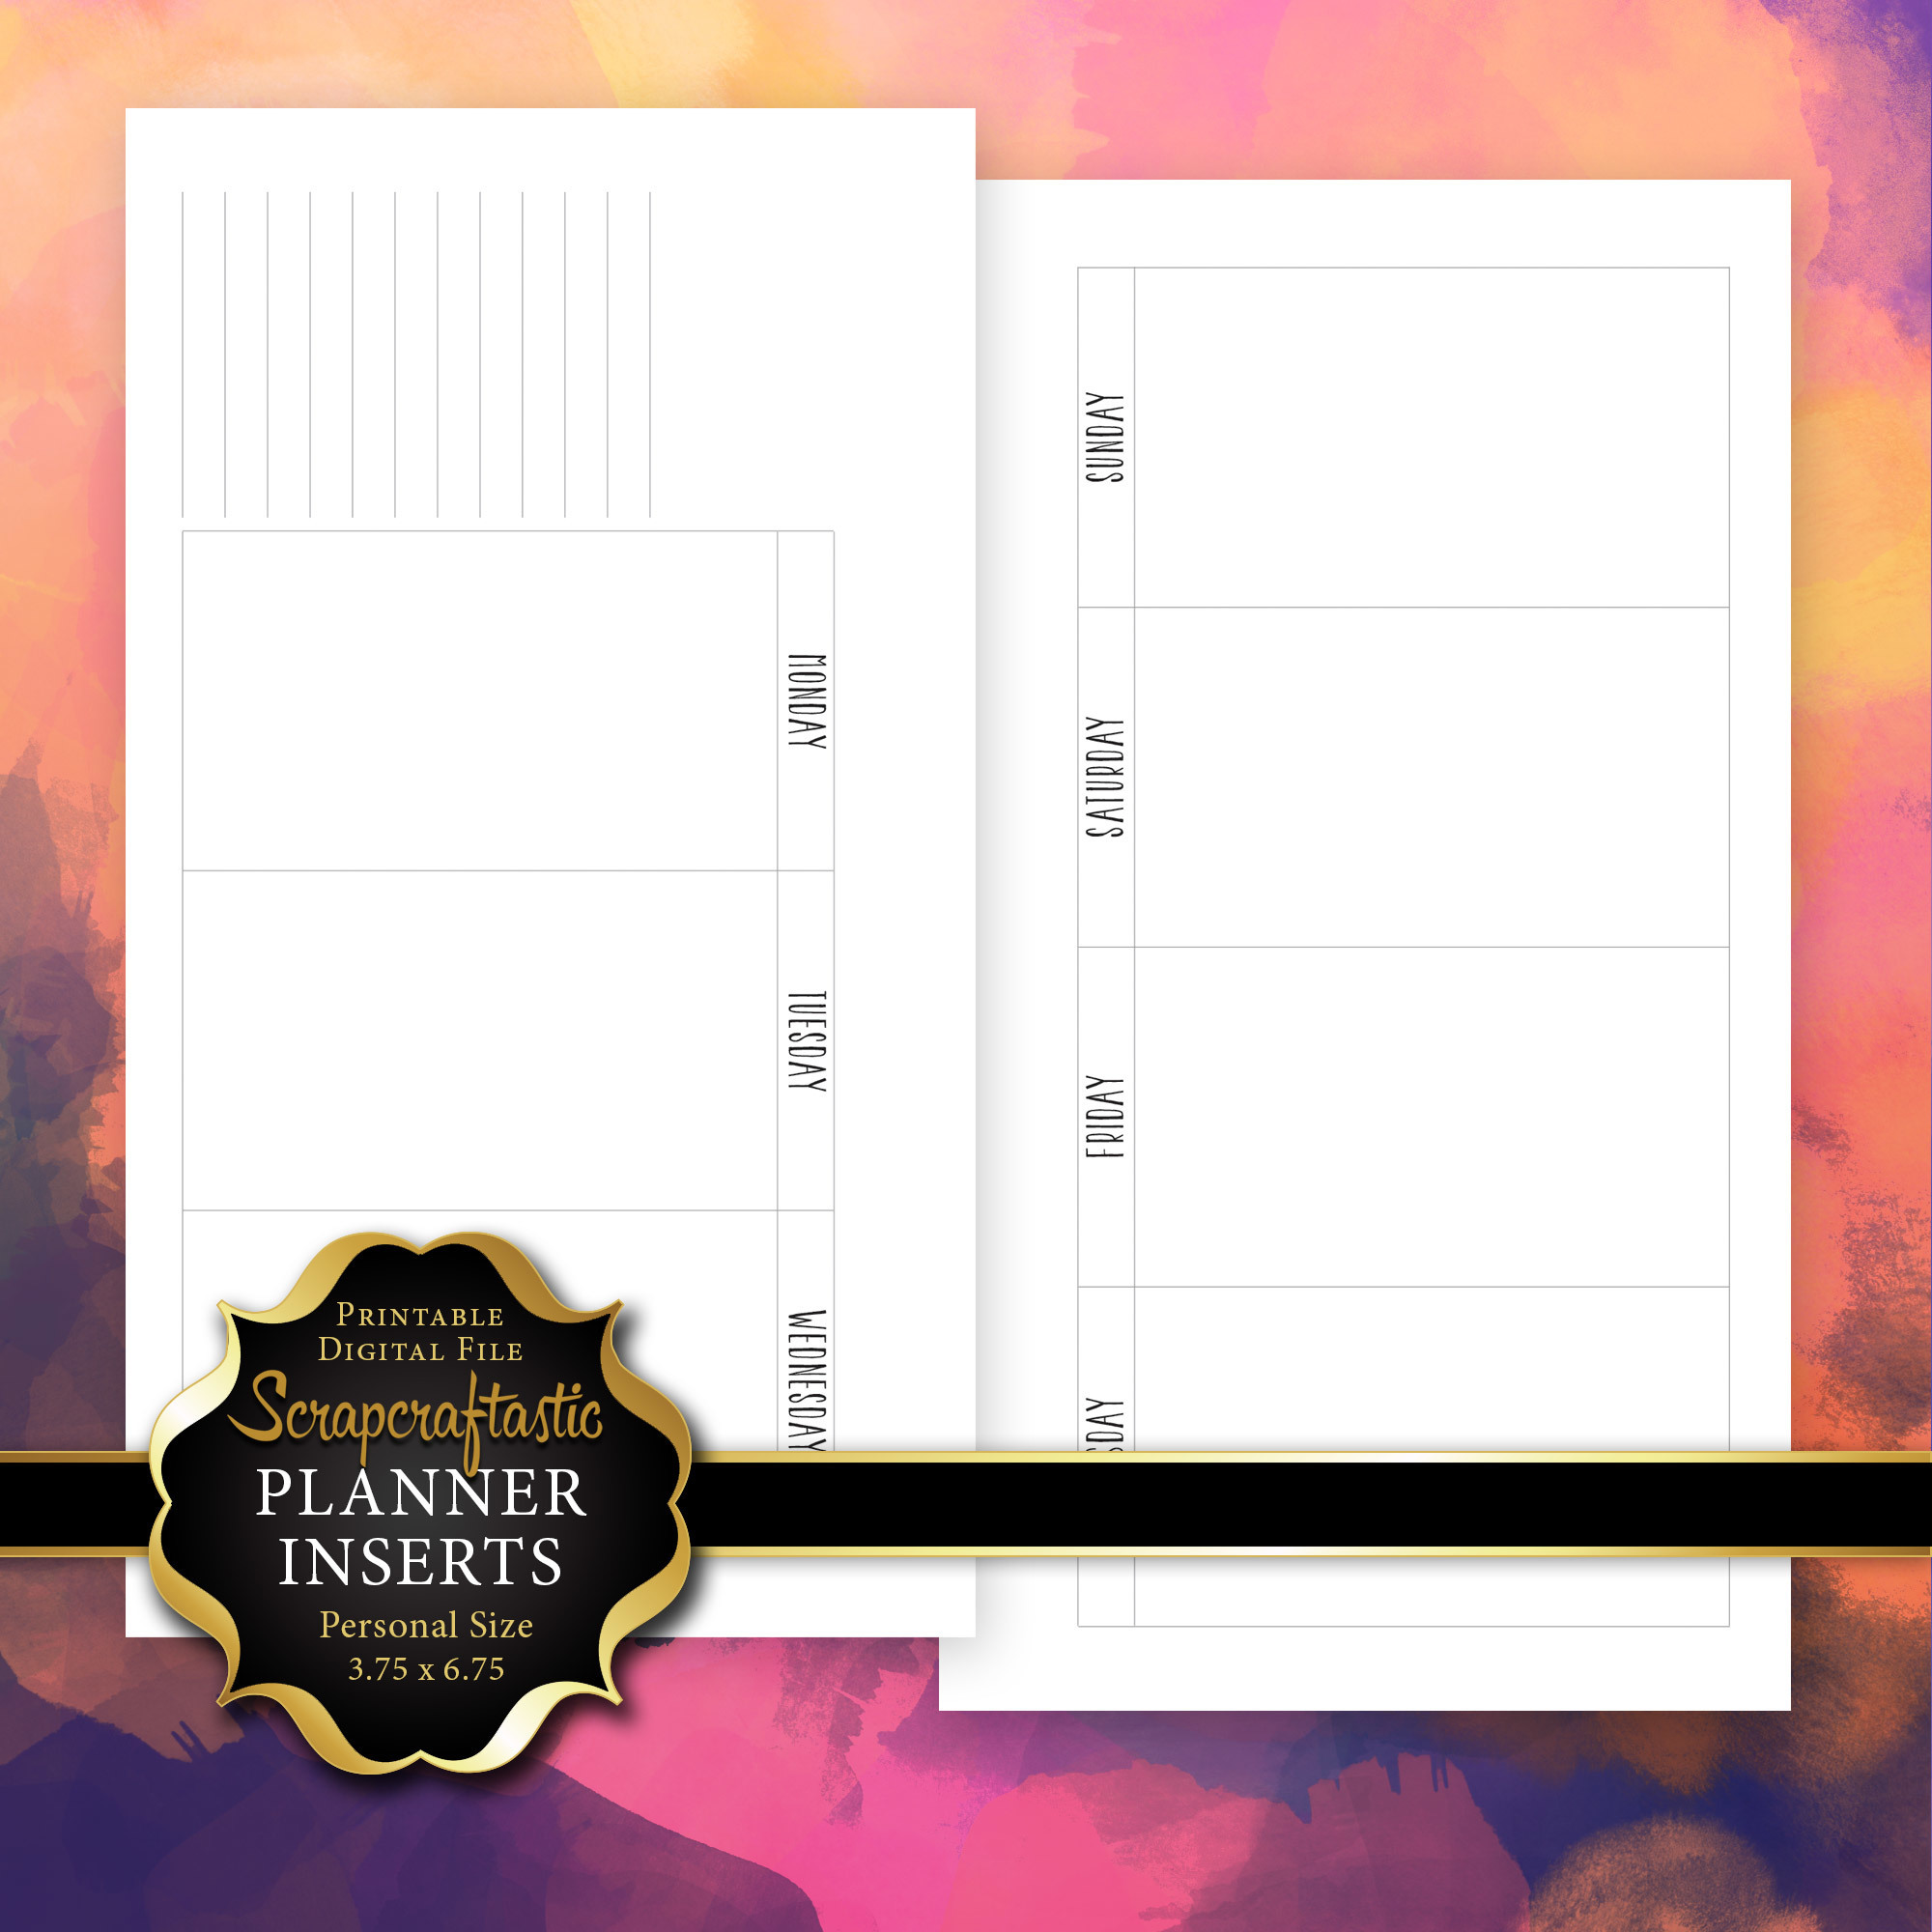 Full Horizontal WO2P Planner Printable Insert Refill Personal Size - Filofax, Kikki K, ColorCrush 00209